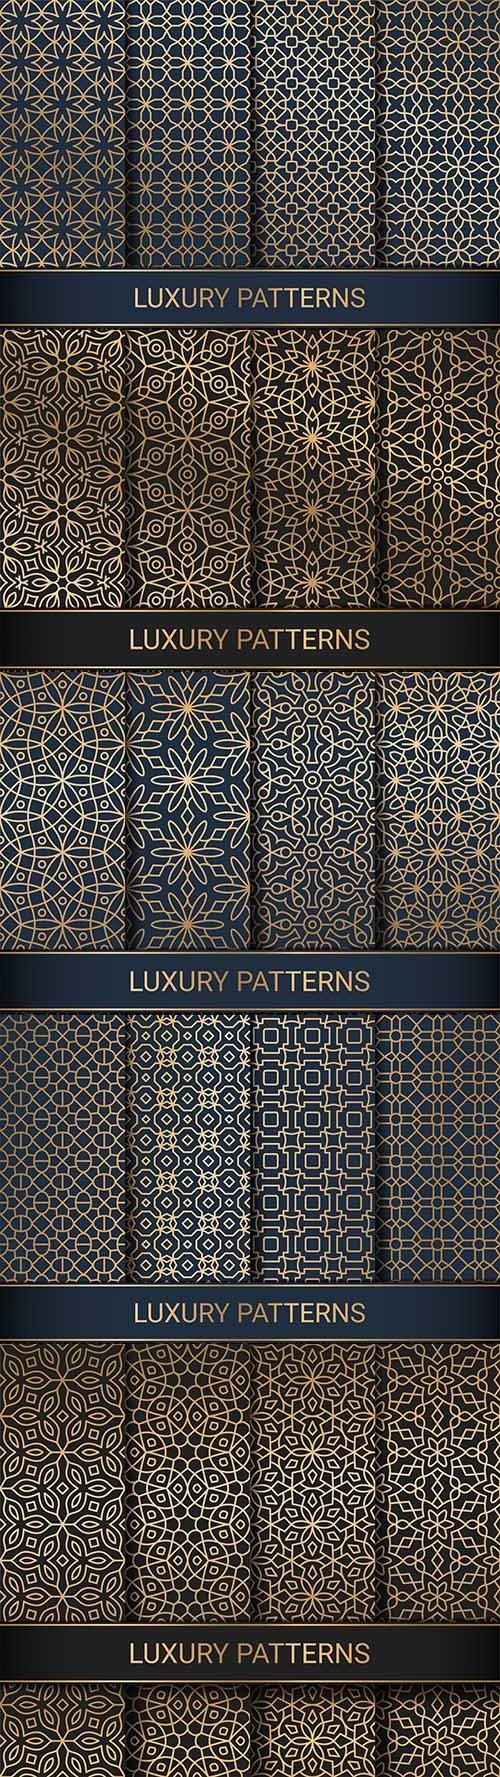 Luxury seamless decorative patterns for creativity